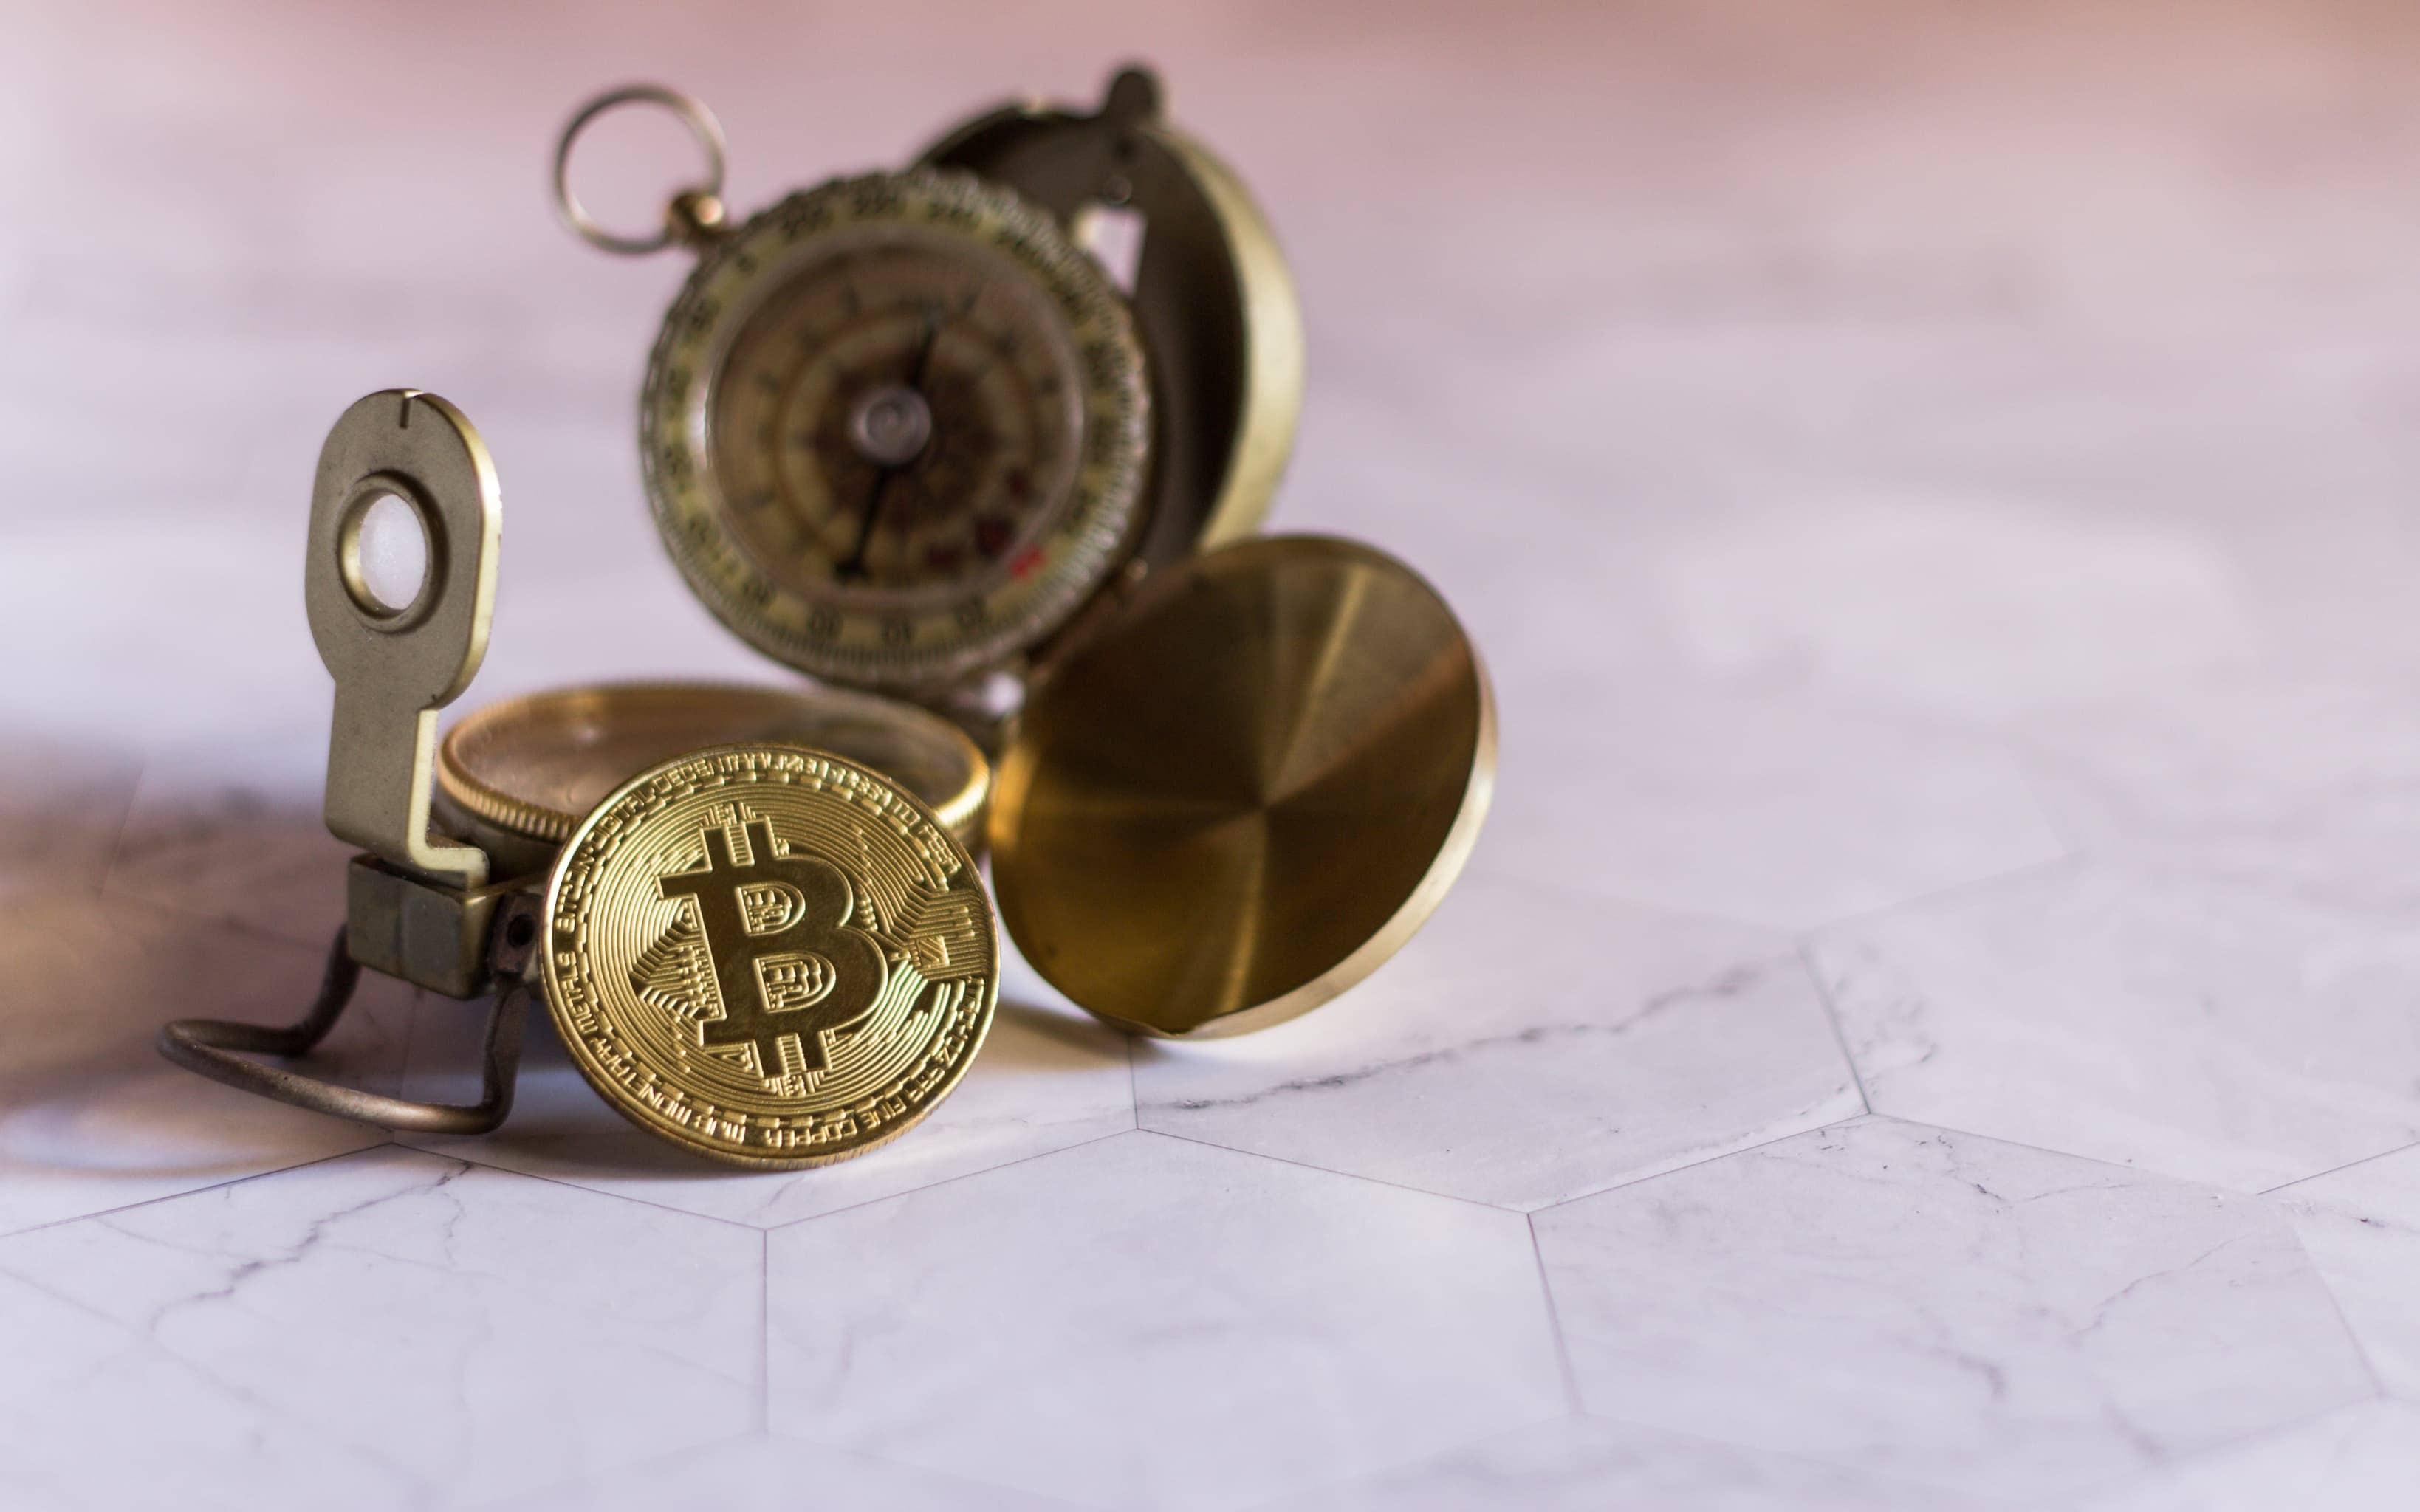 Bitcoin-Kurs (BTC): Diese Indikatoren stimmen bullish